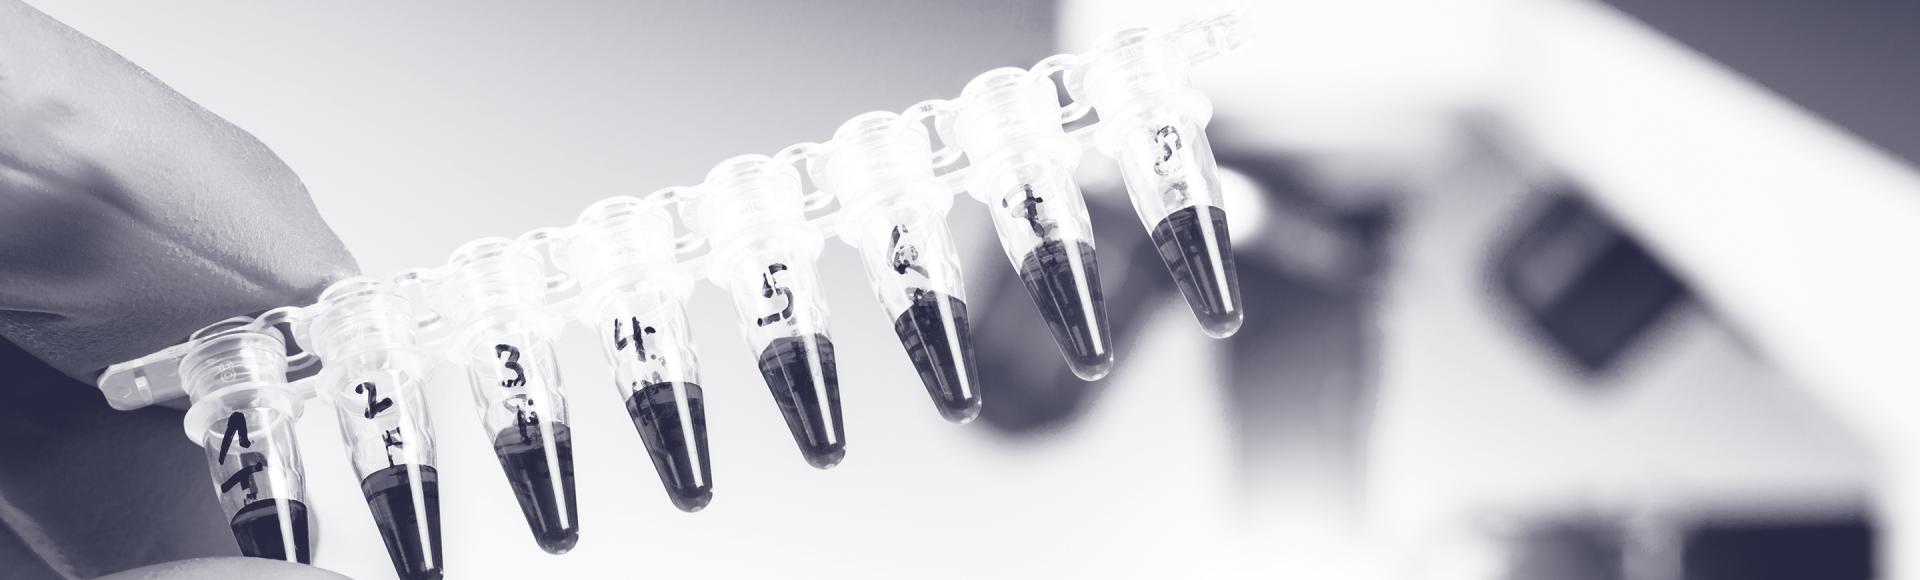 ARK-Invest_Blog-Banner_2019_05_15---Liquid-Biopsies